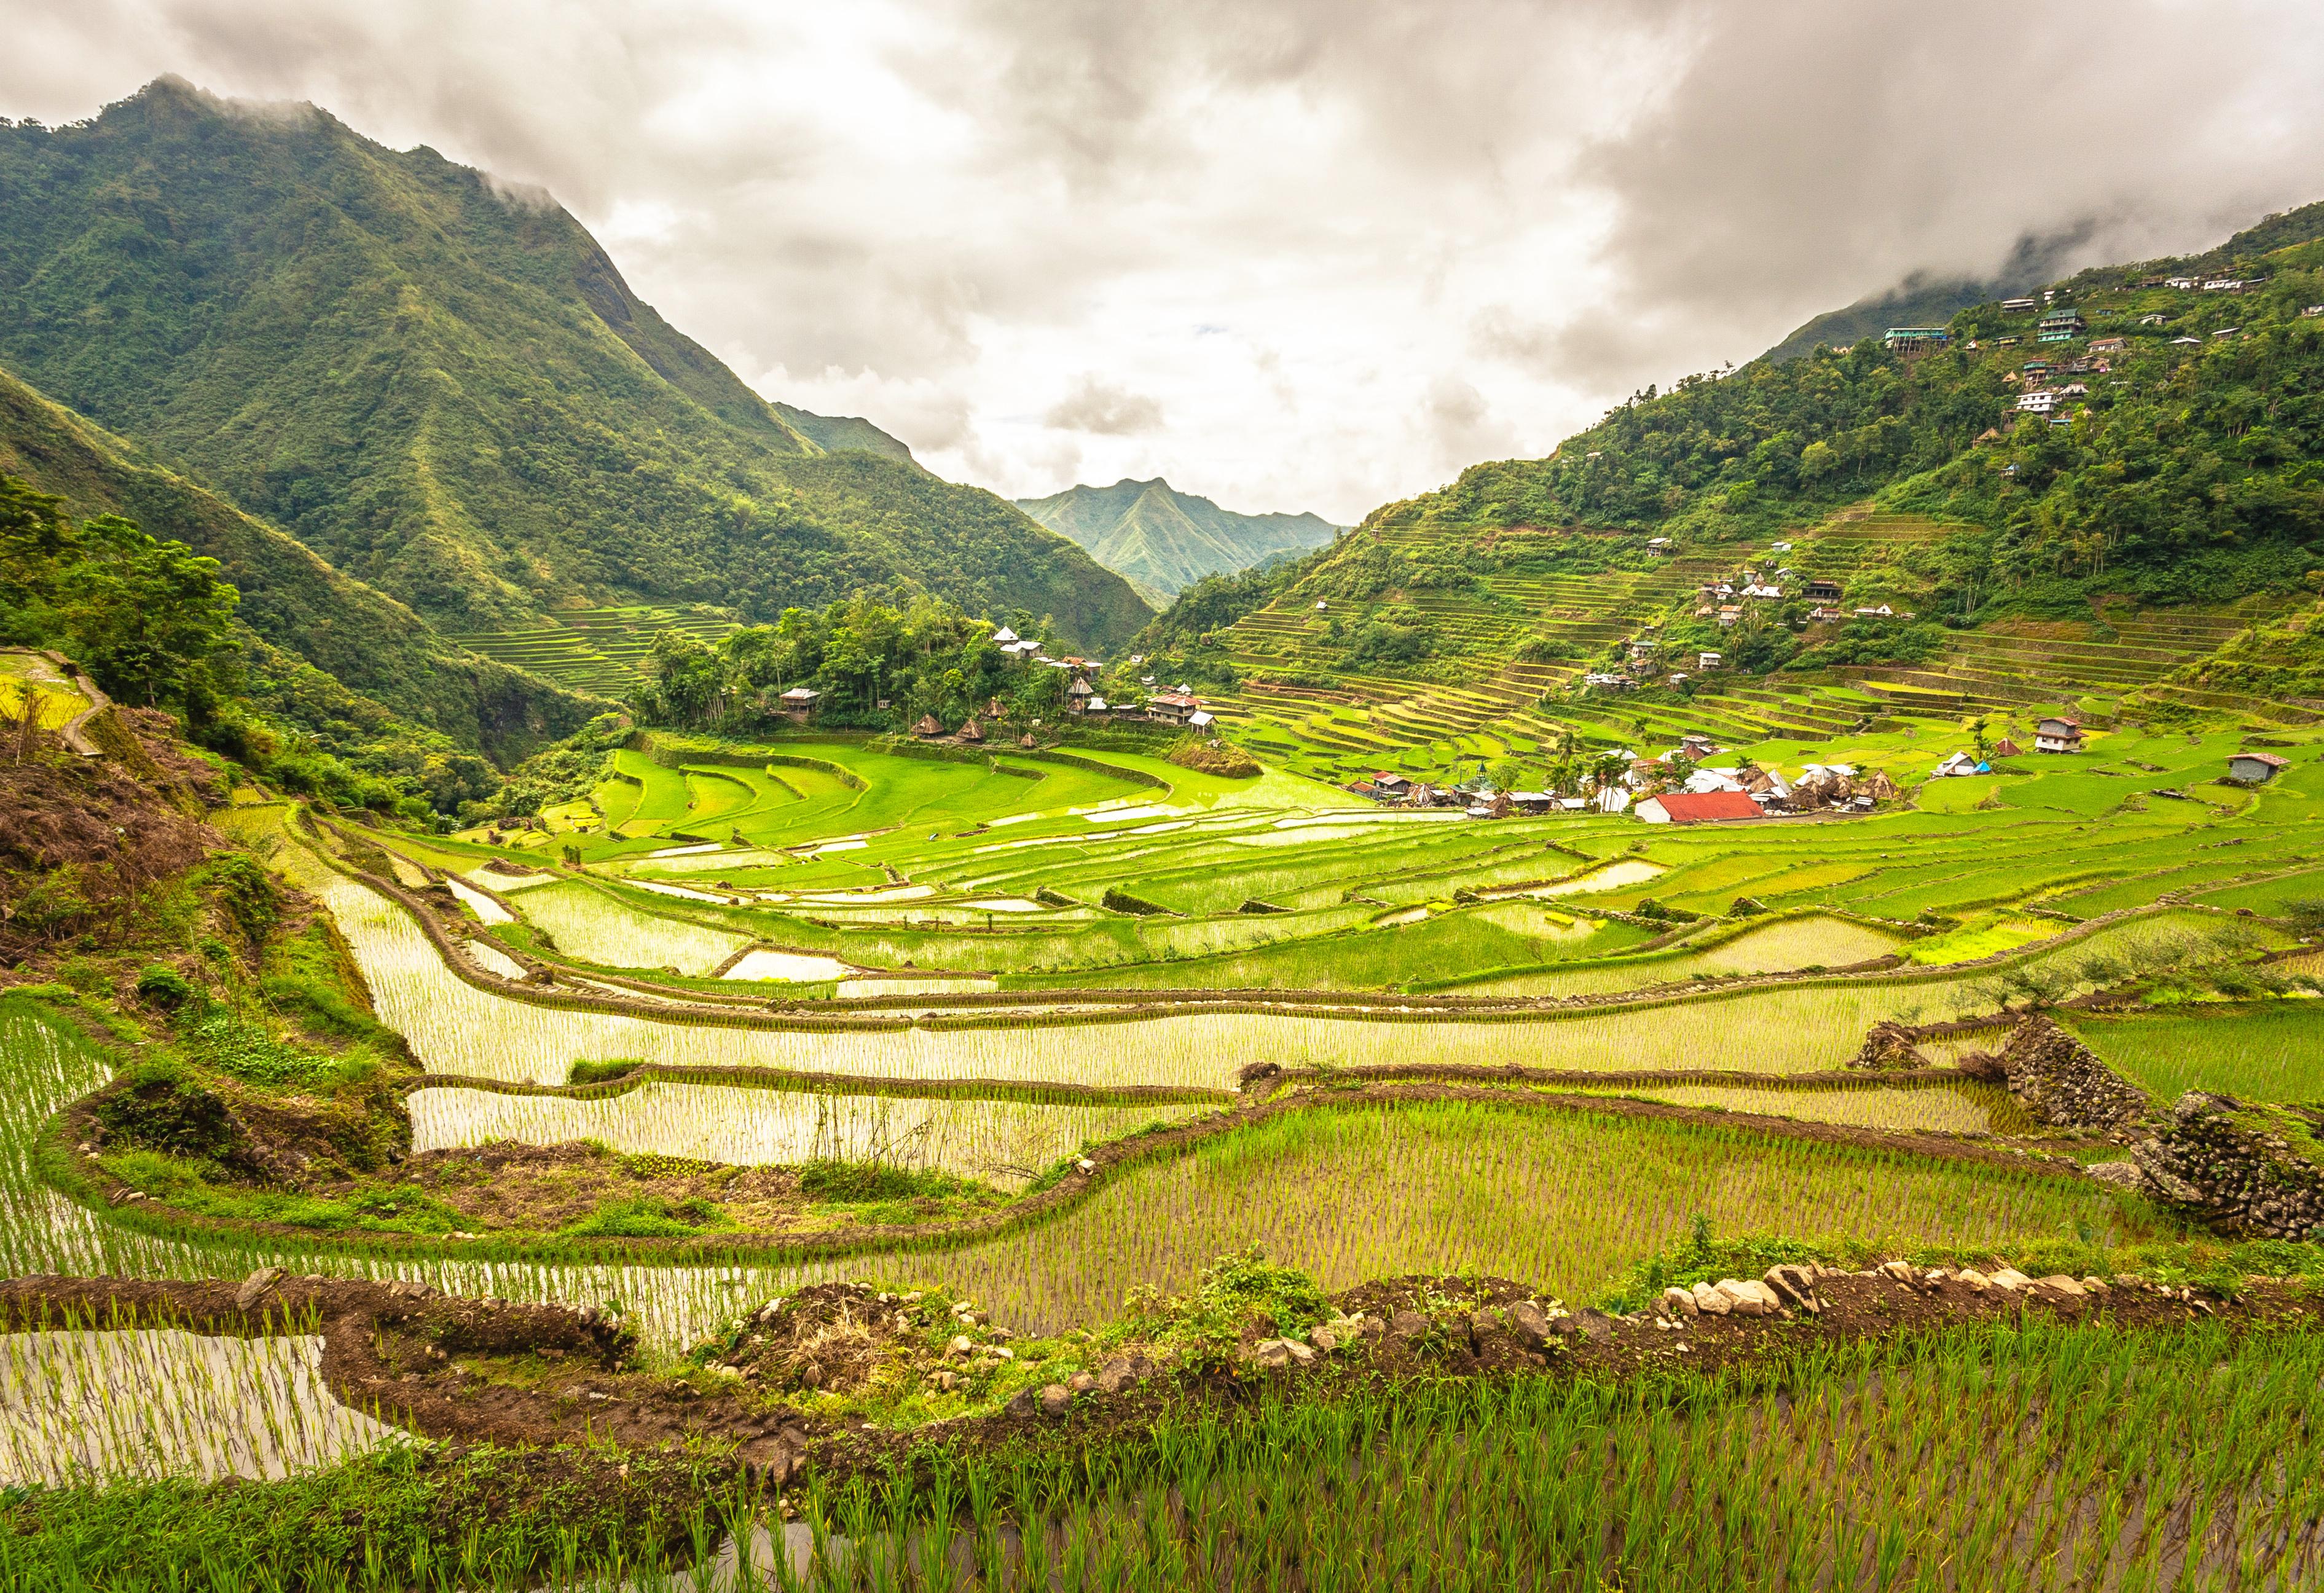 Riceterraces3